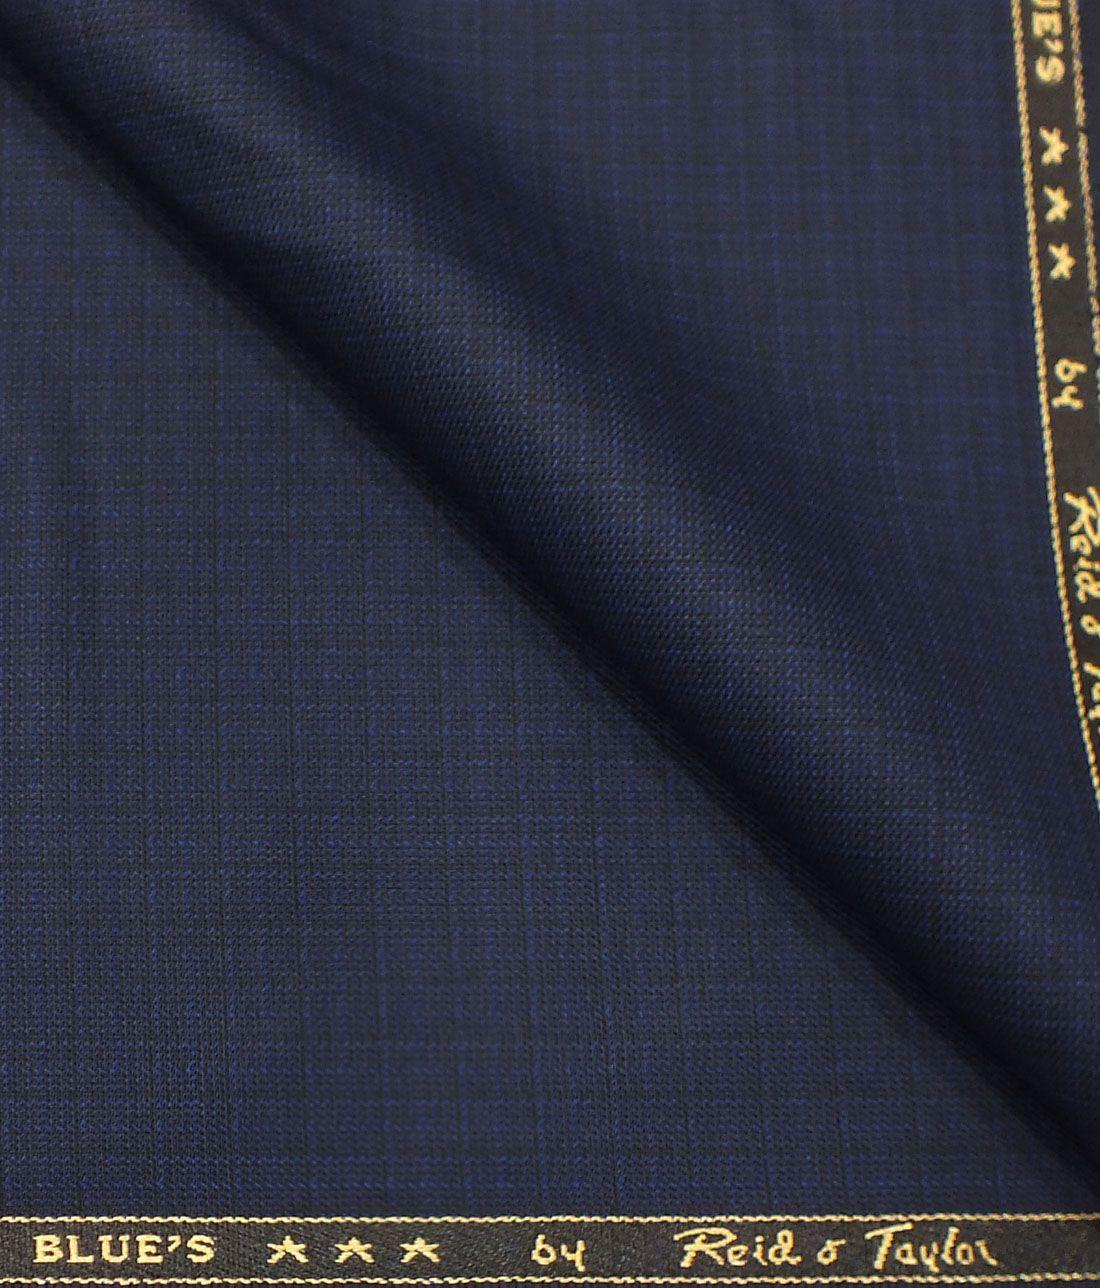 6fad04cd8 Reid   Taylor Men s Dark Royal Blue Self Design Poly Viscose Trouser Fabric  or 3 Piece Suit Fabric (Unstitched - 1.25 Mtr)